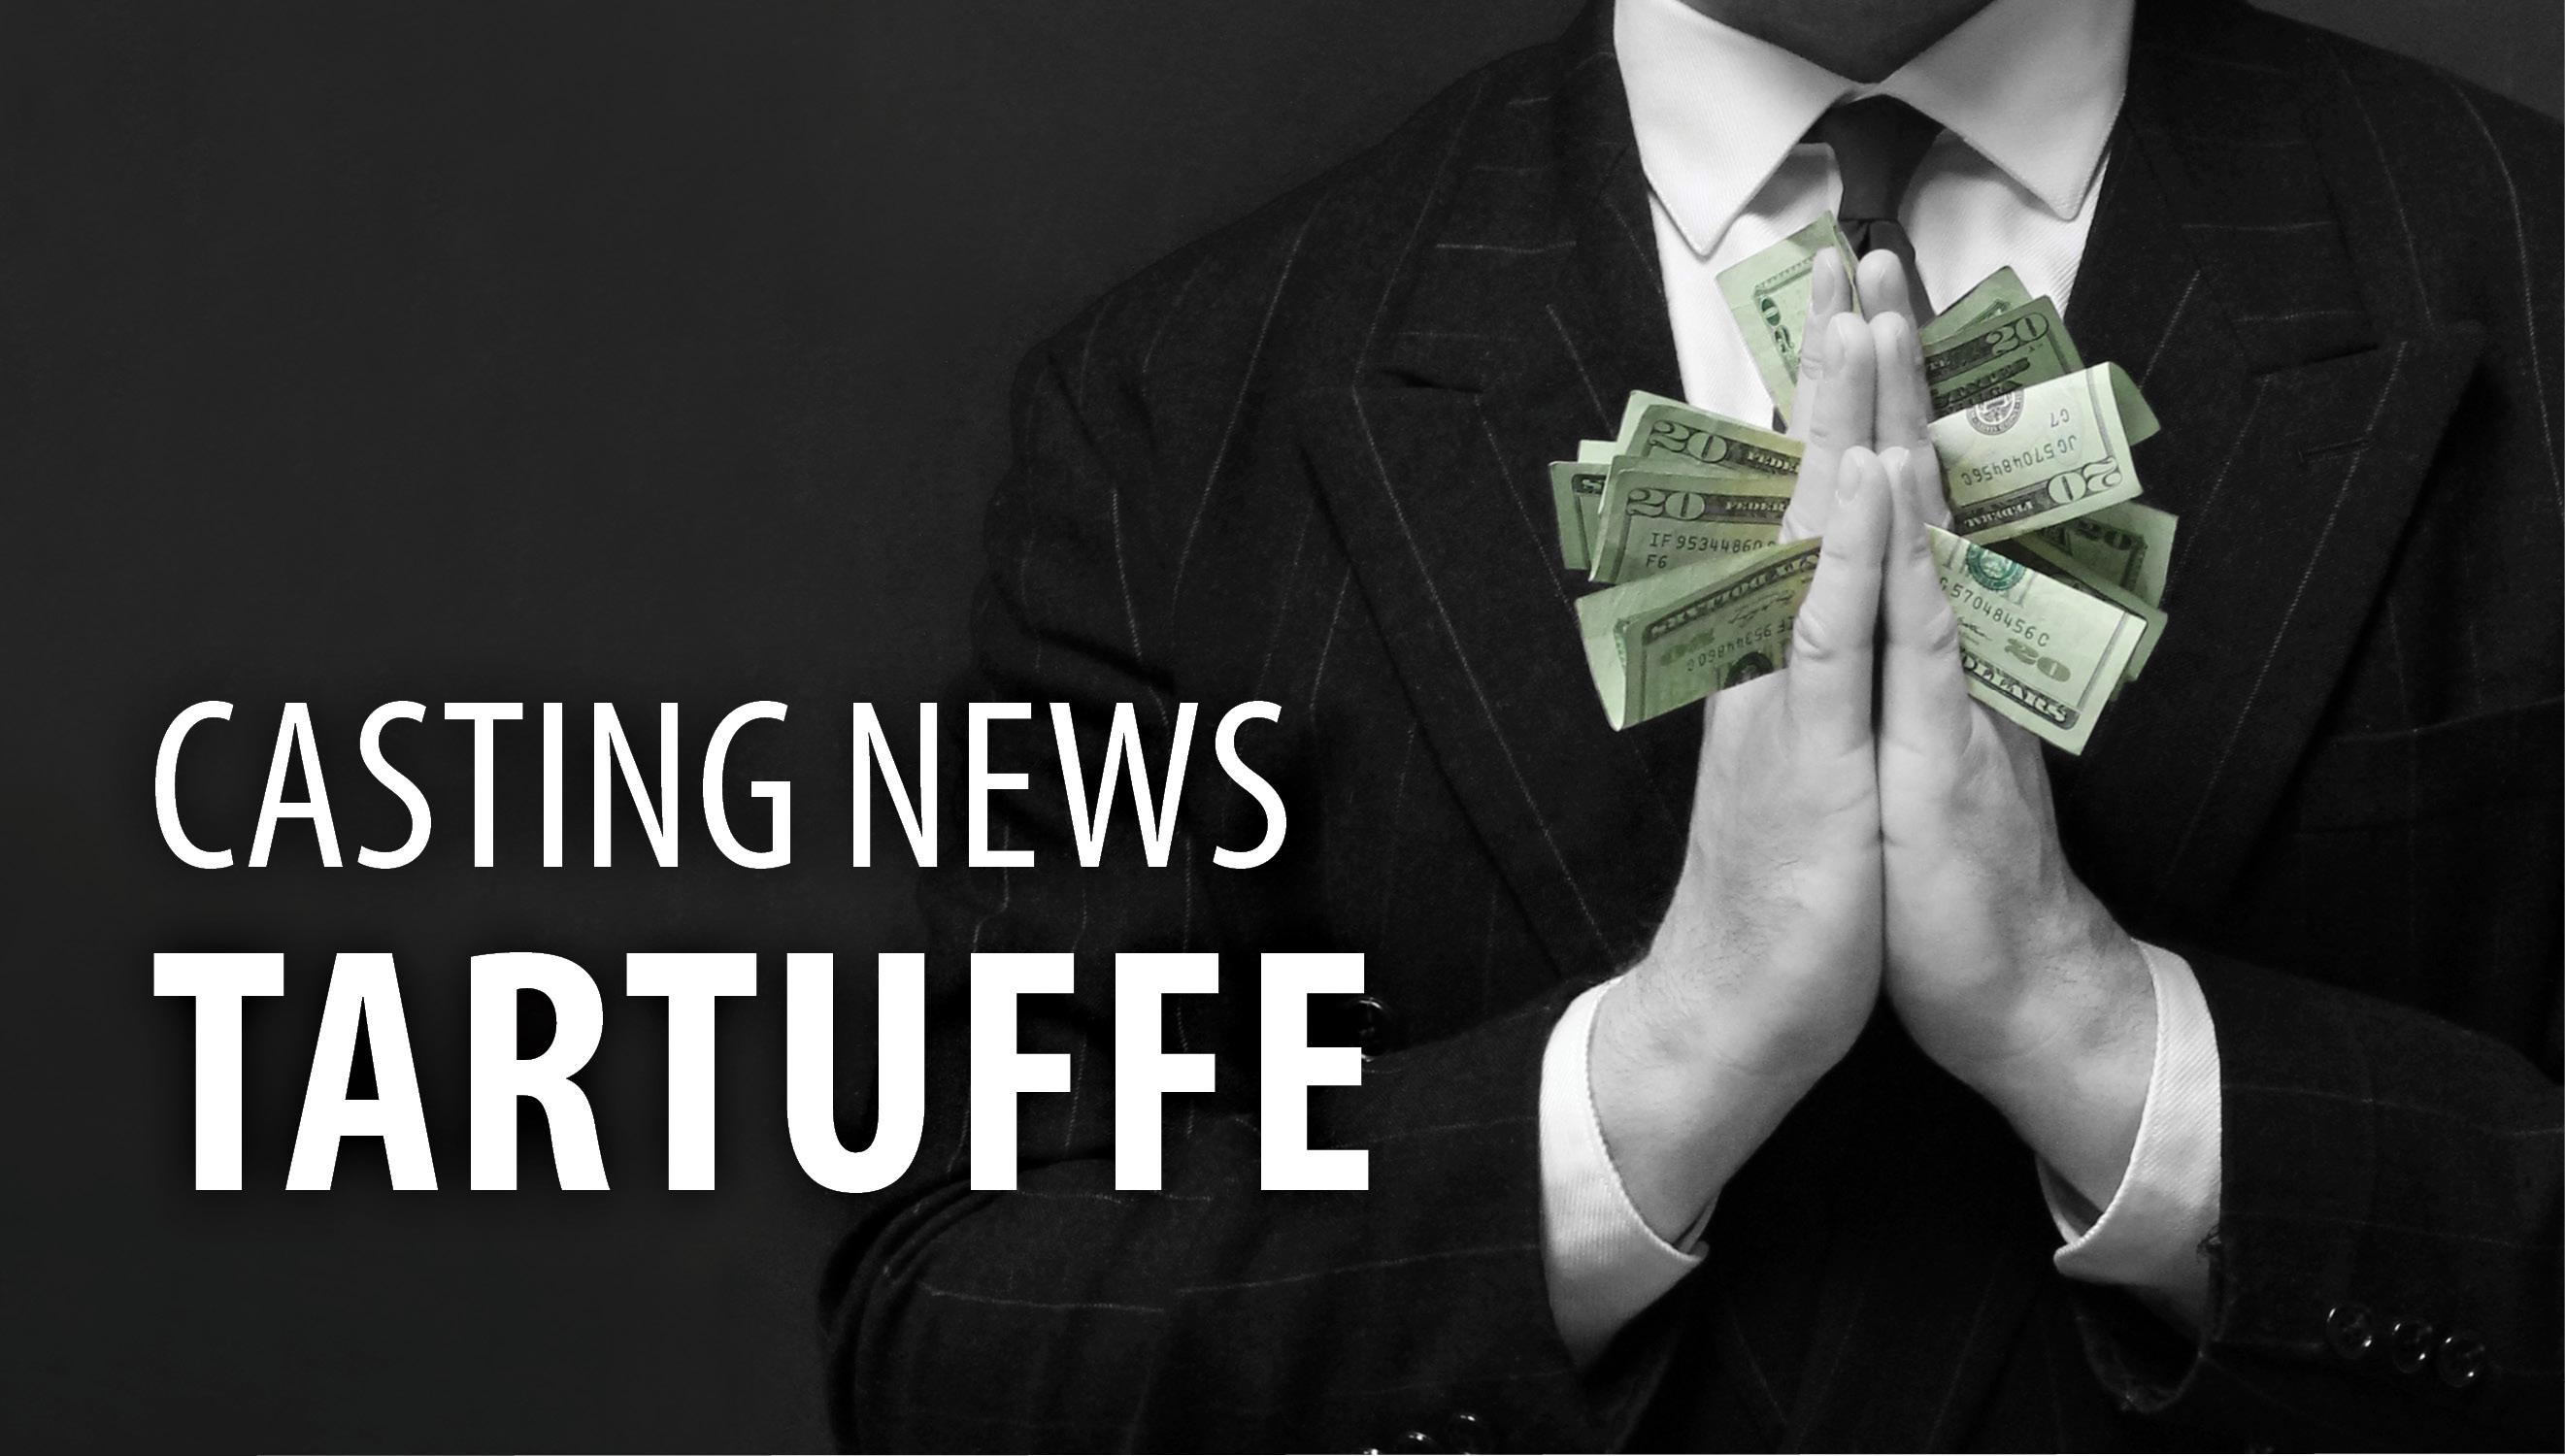 Casting News: Tartuffe